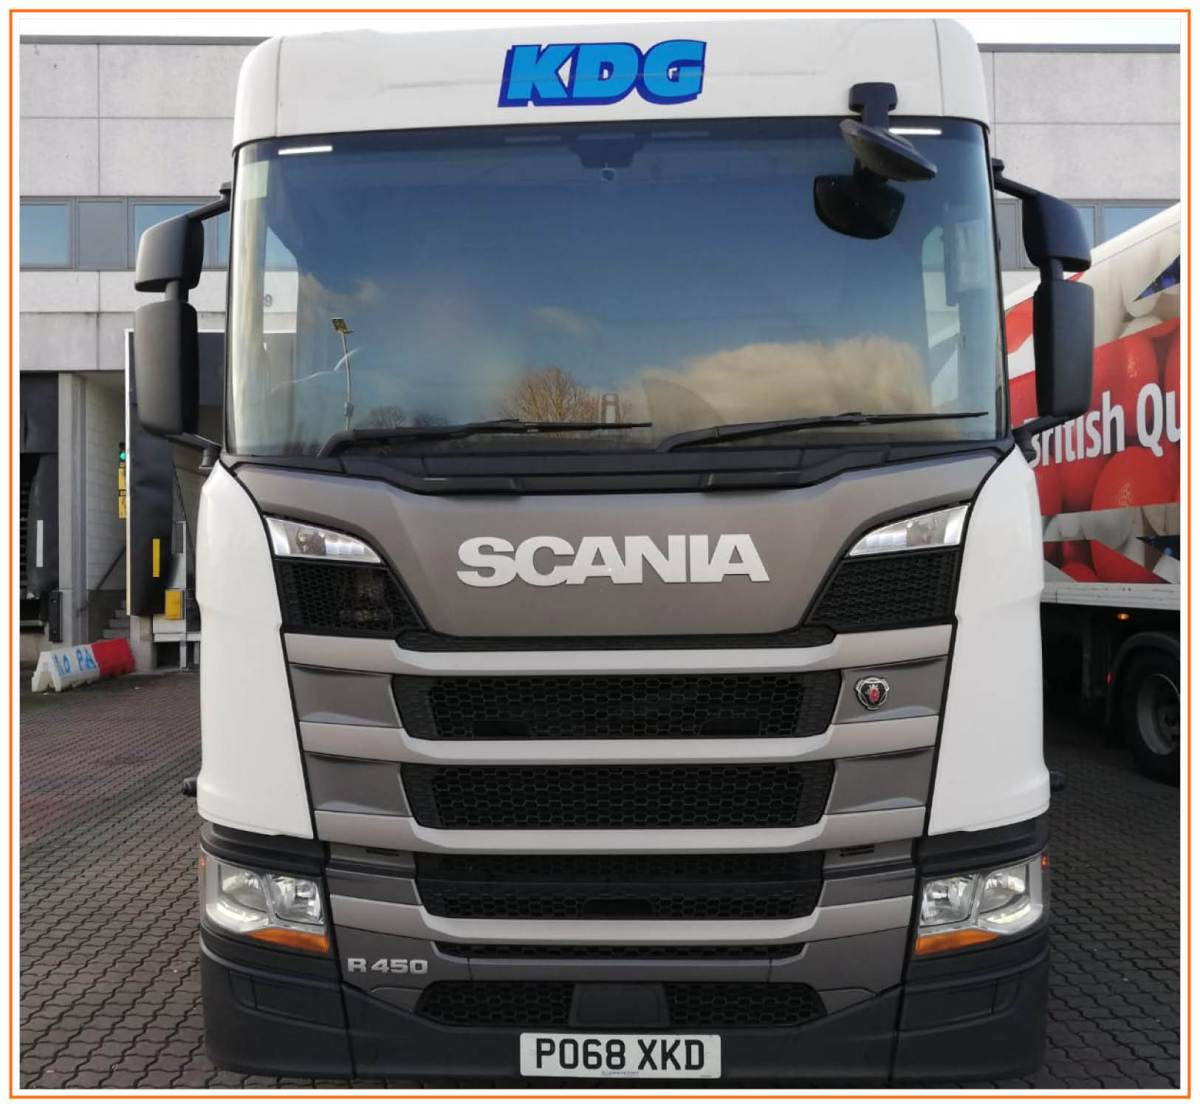 https://i1.wp.com/haultech.co.uk/wp-content/uploads/2020/01/KDG-Transport-Benefit-from-Integrated-TrakMan-Solution.jpg?fit=1200%2C1108&ssl=1